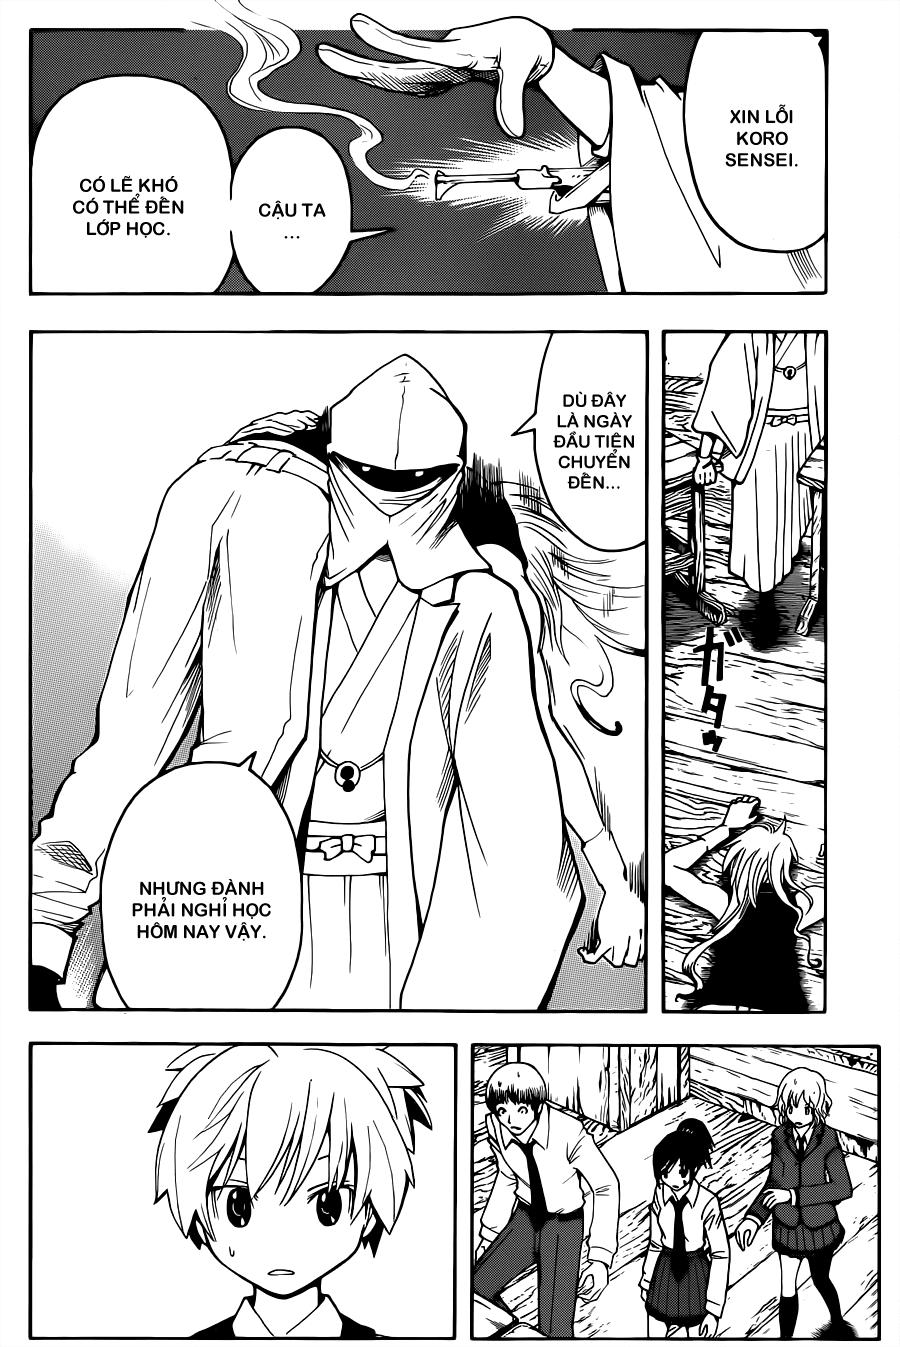 Ansatsu Kyoushitsu chap 32 trang 5